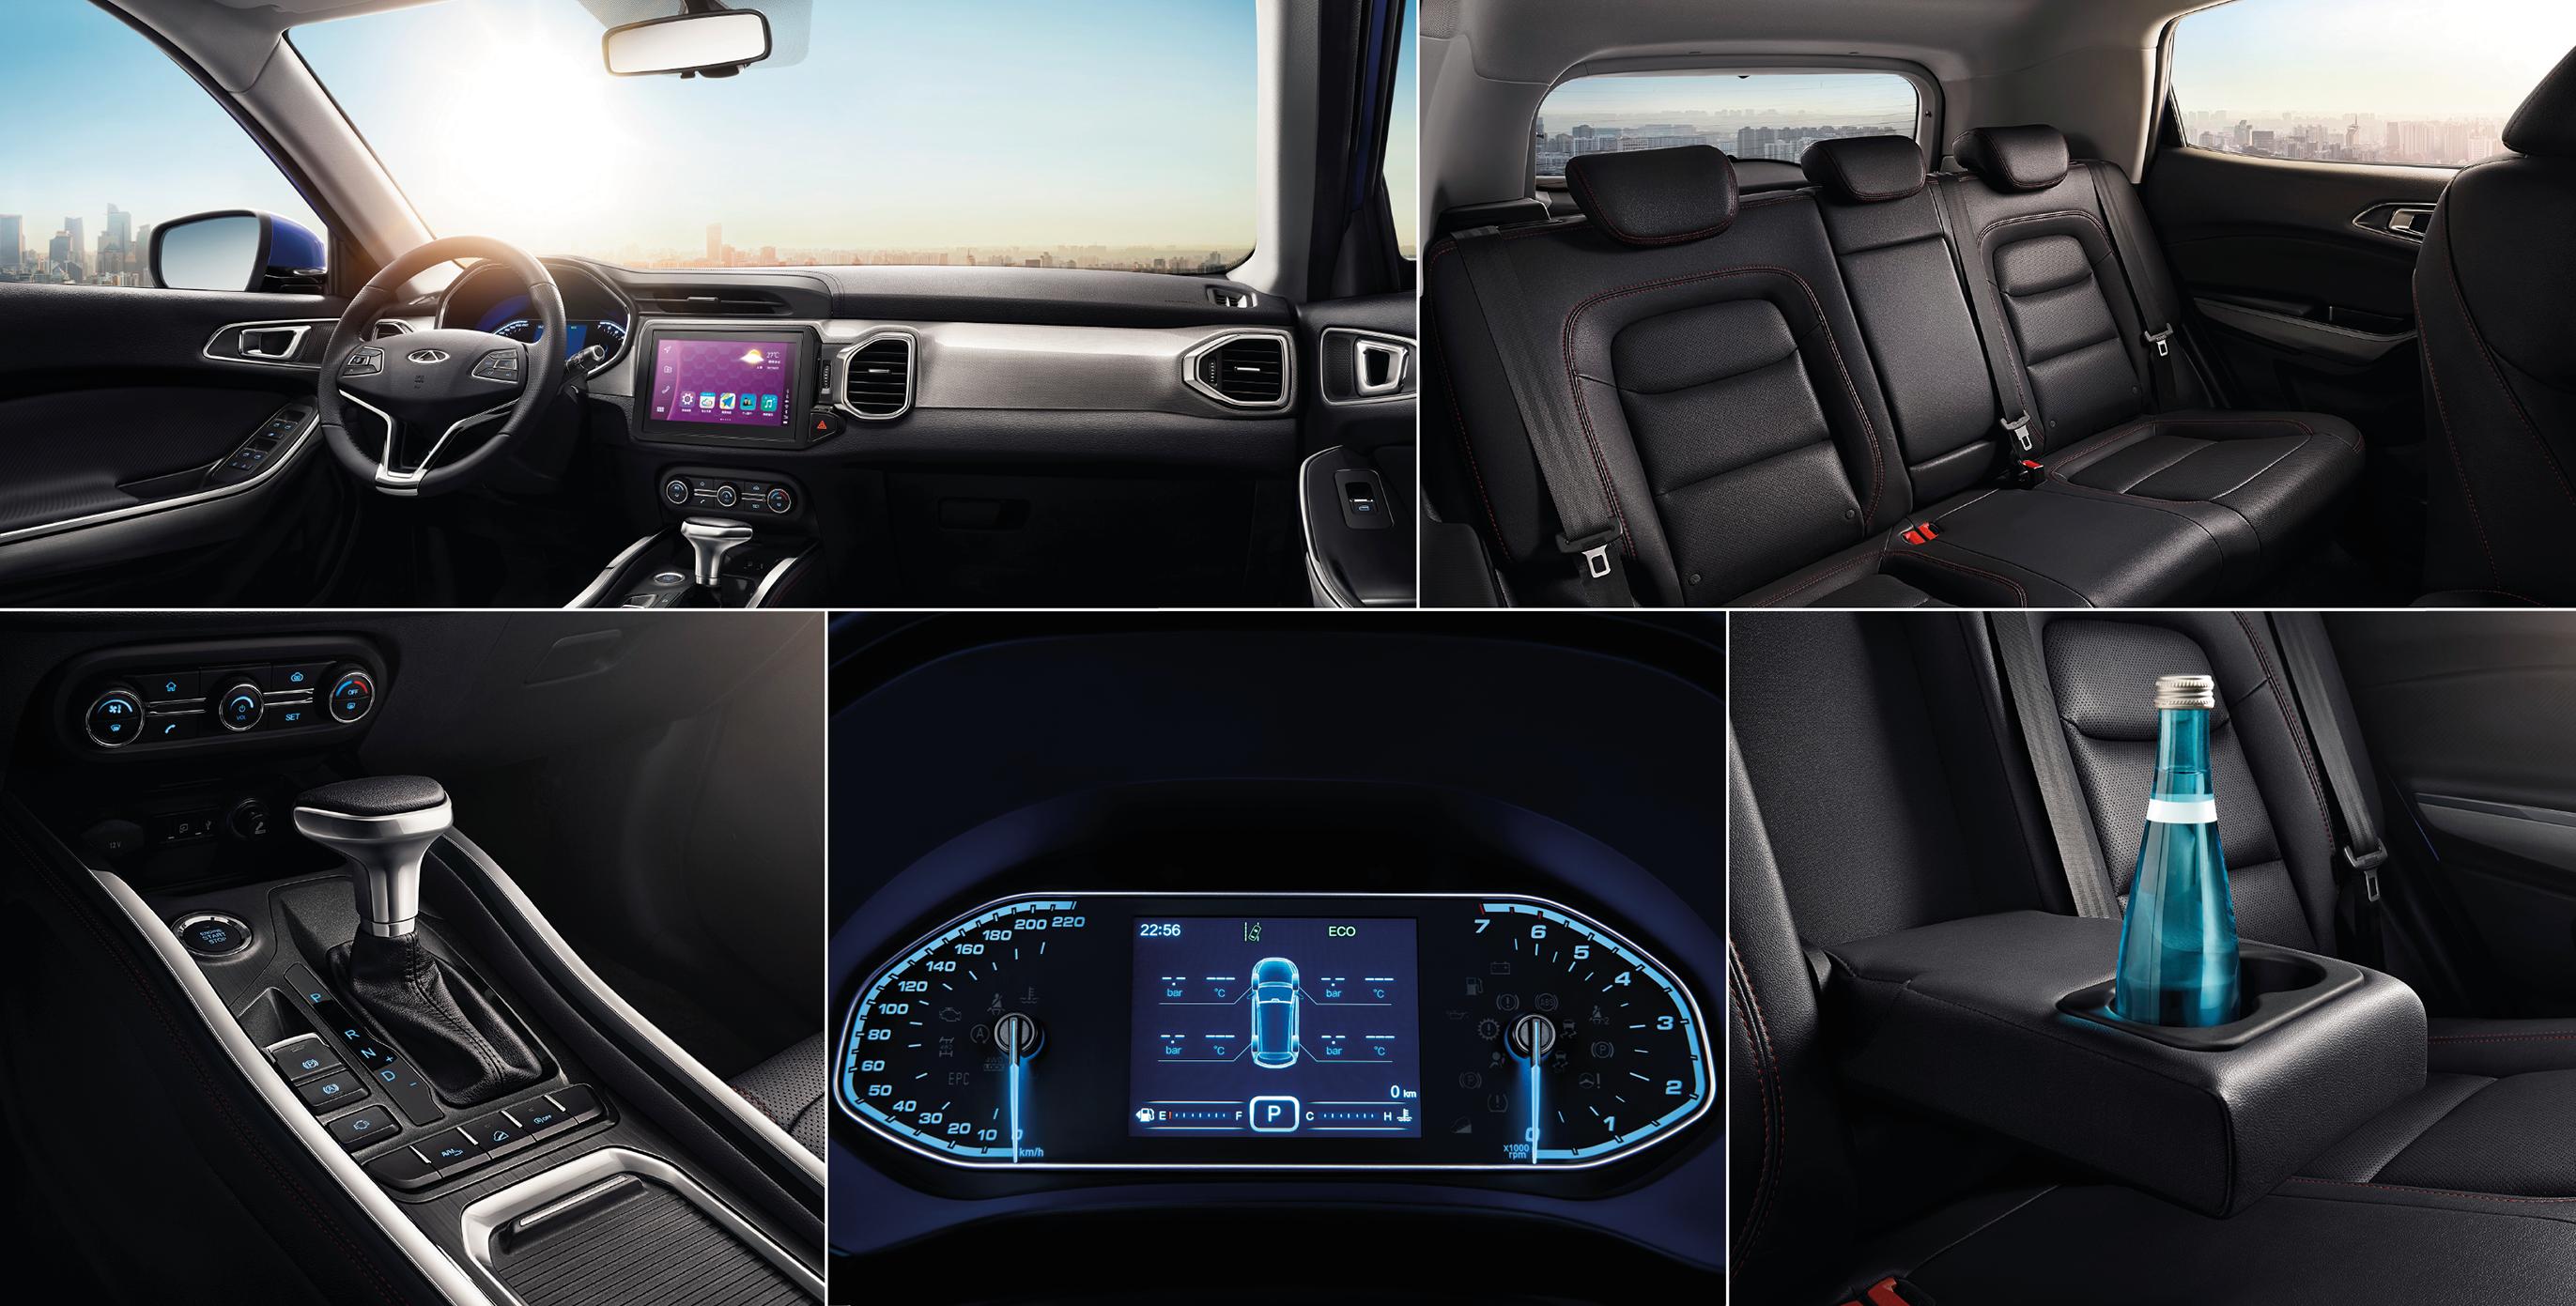 Chery Tiggo 4 1.5 Turbo interior featuers